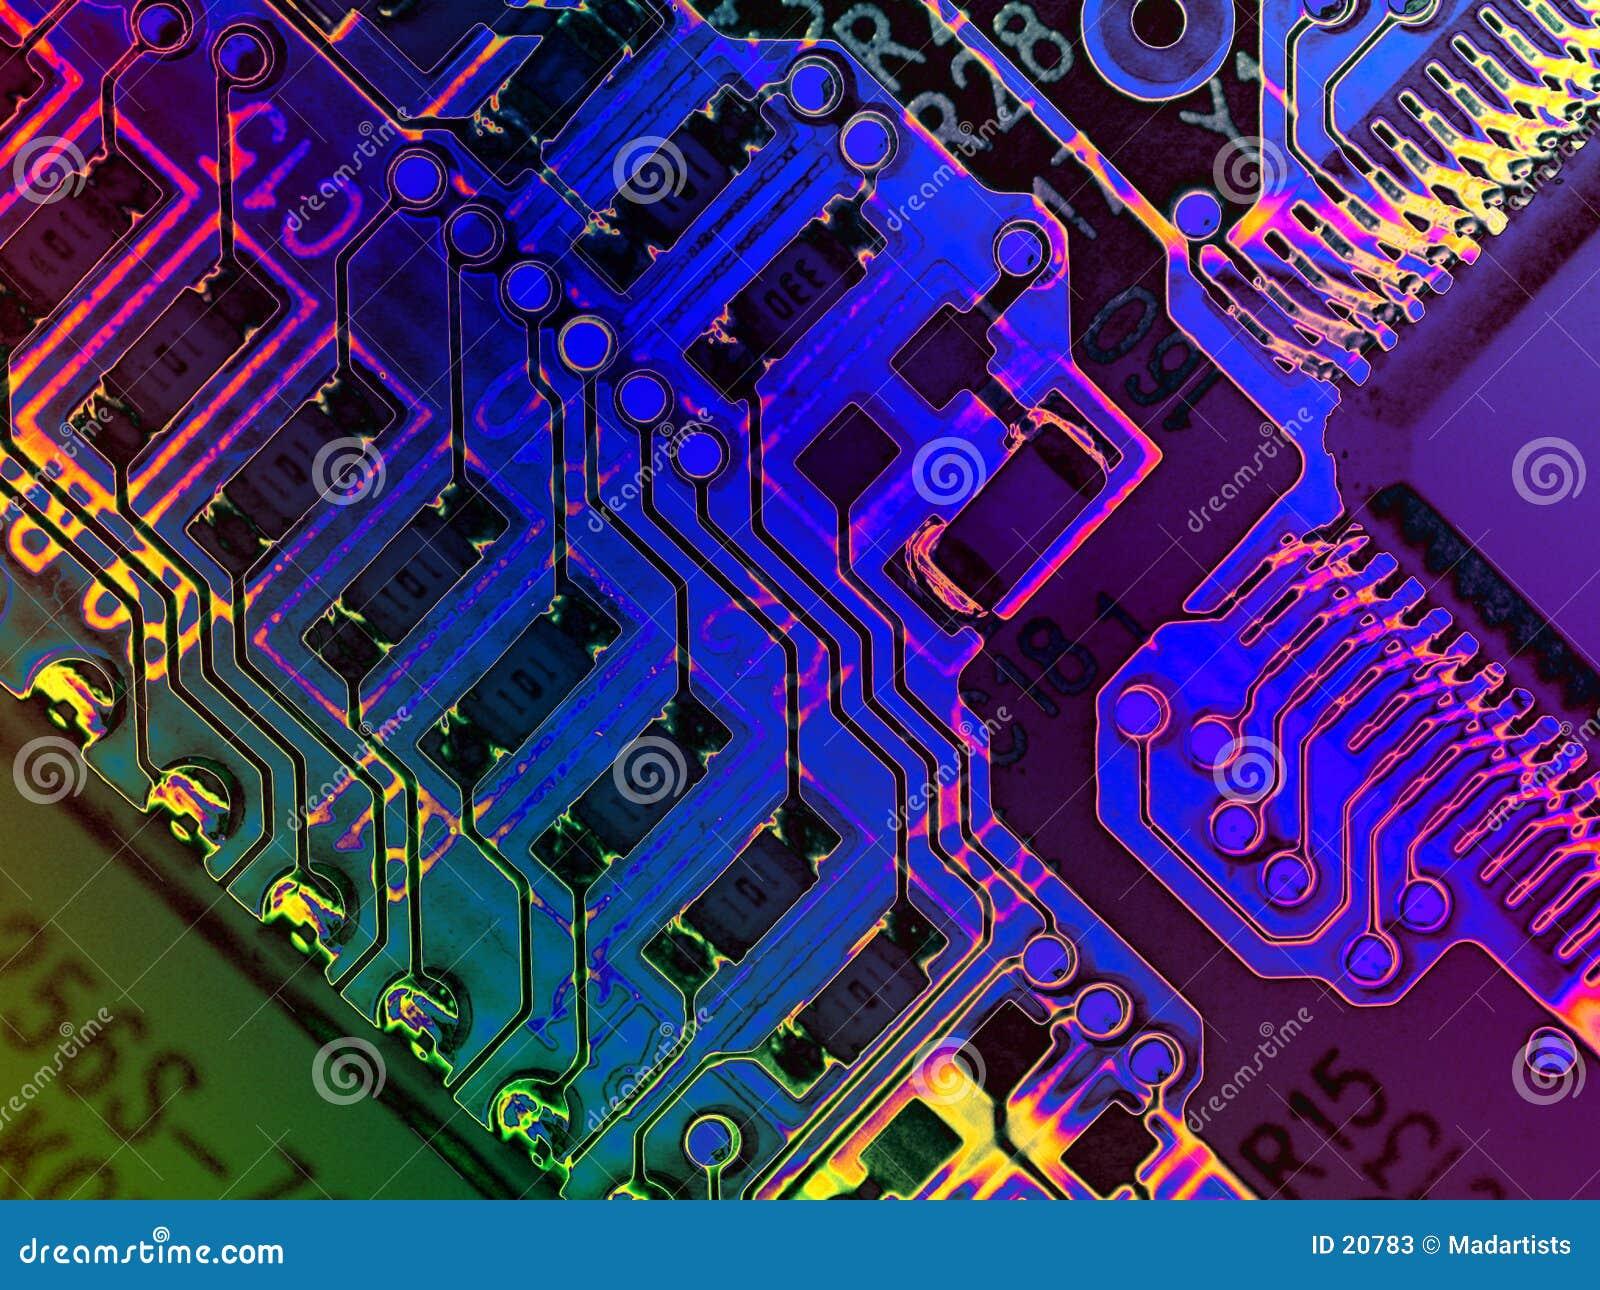 Cool Grunge Computer Textures